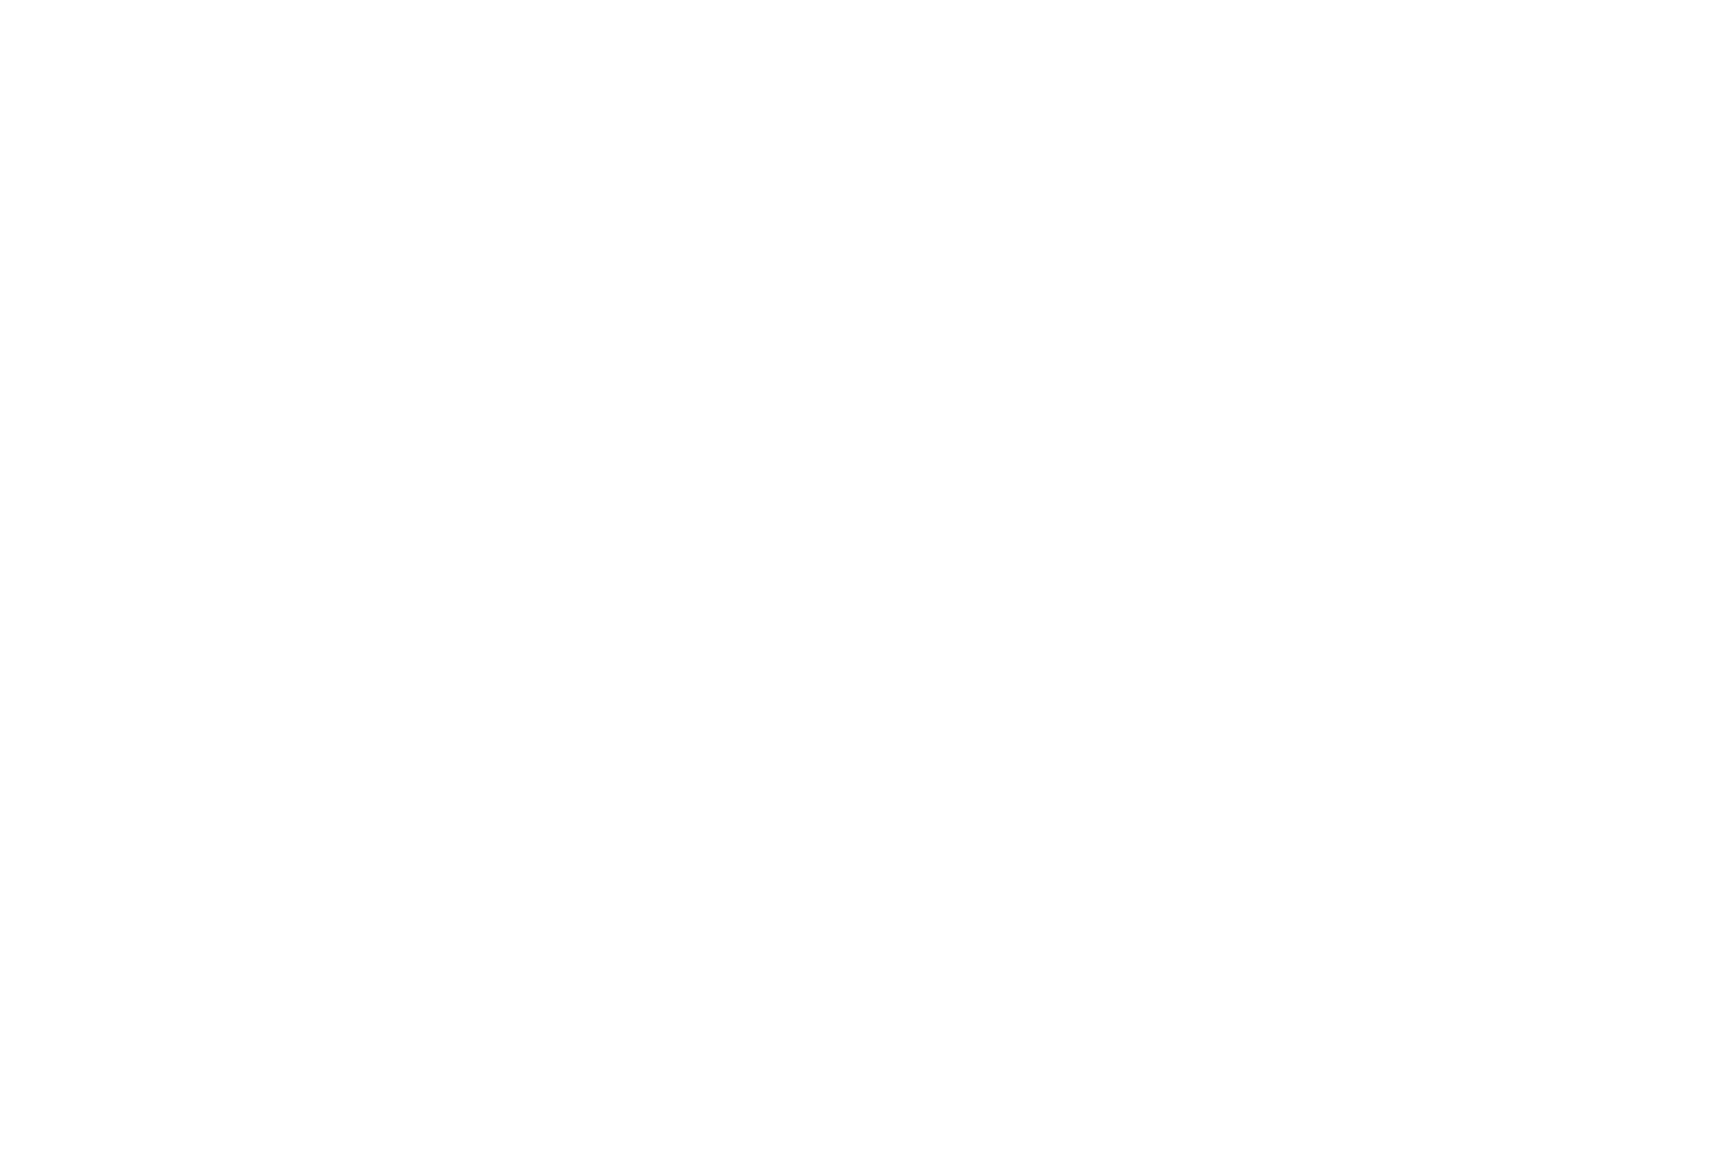 SEMI-FINALIST-Los-Angeles-International-Screenplay-Awards-2020_White